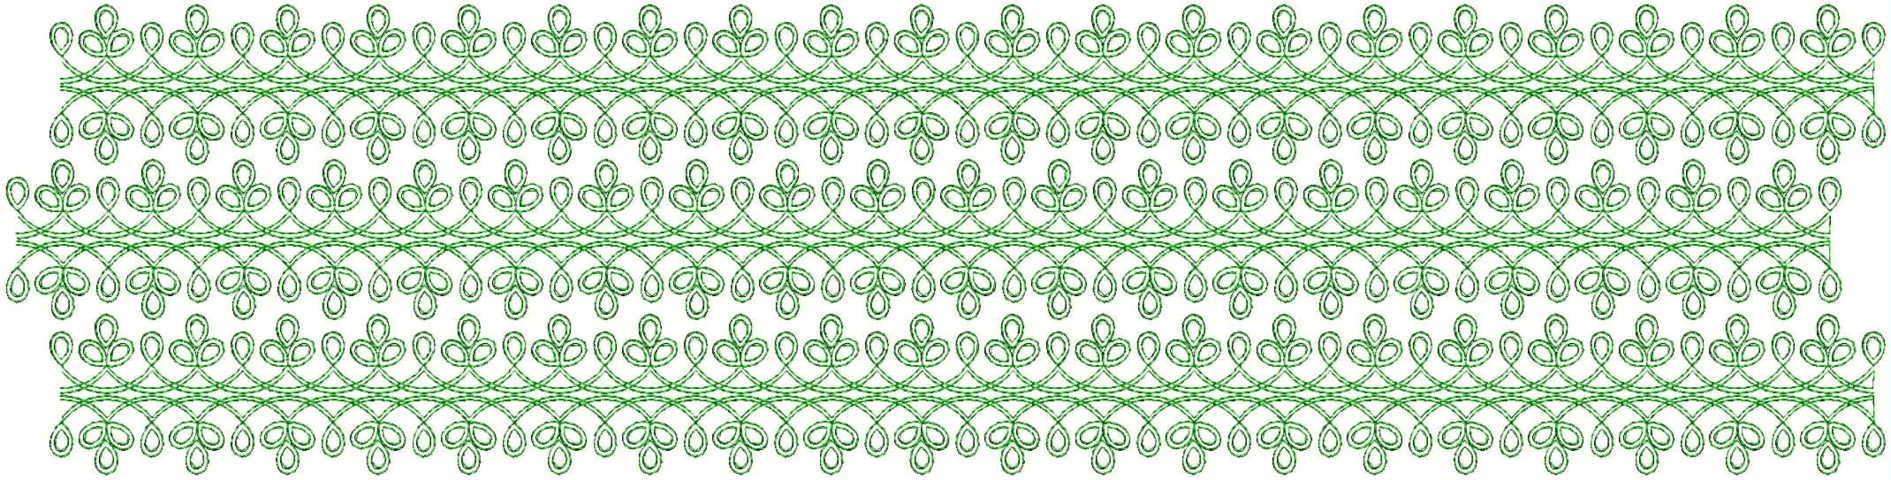 creative  art lace/border embroidery designs